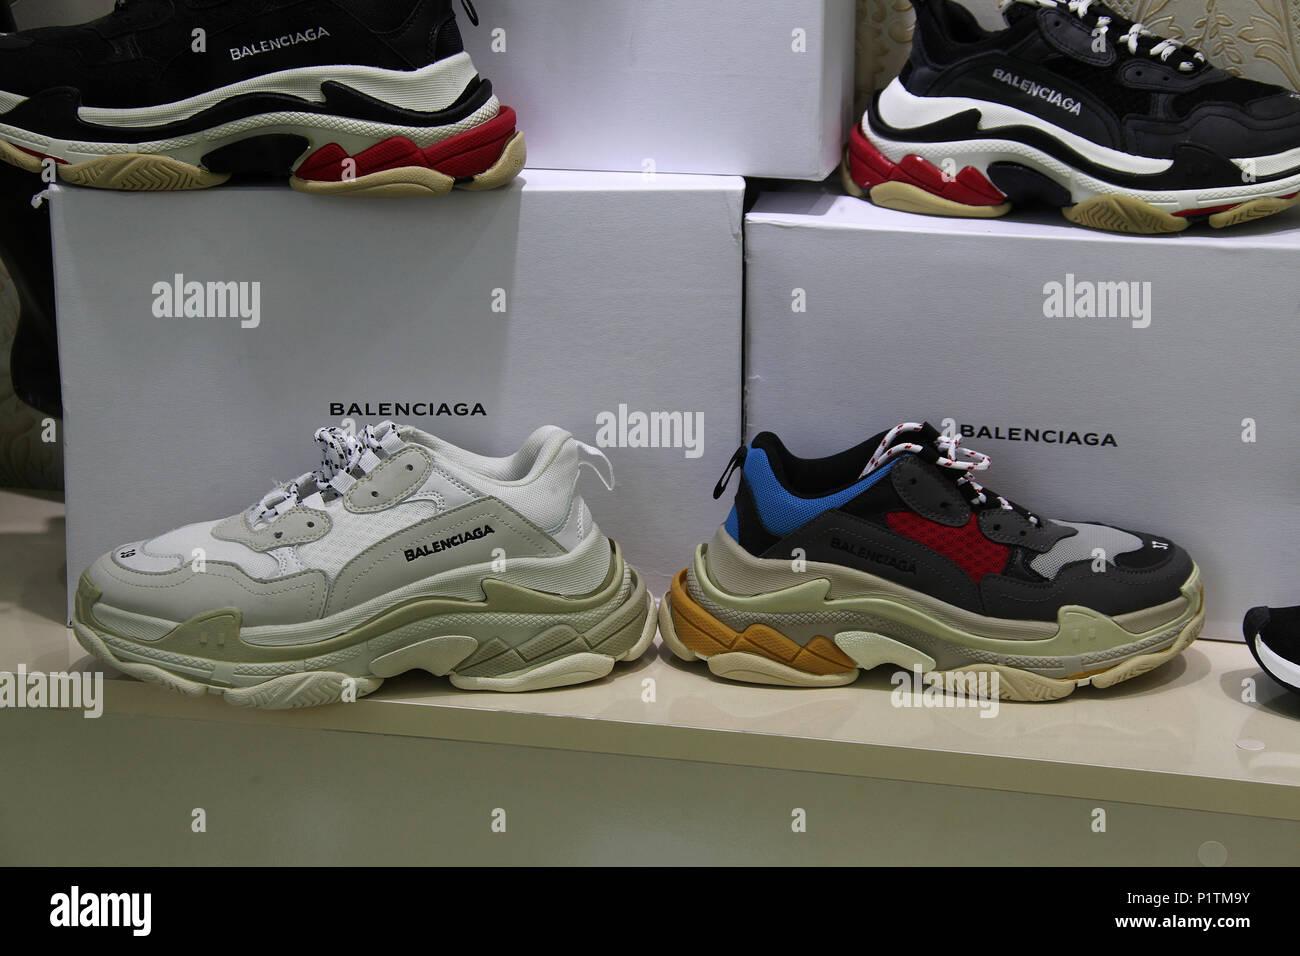 Store Photosamp; Photosamp; Store Images Balenciaga Images Alamy Balenciaga 9W2IEHD